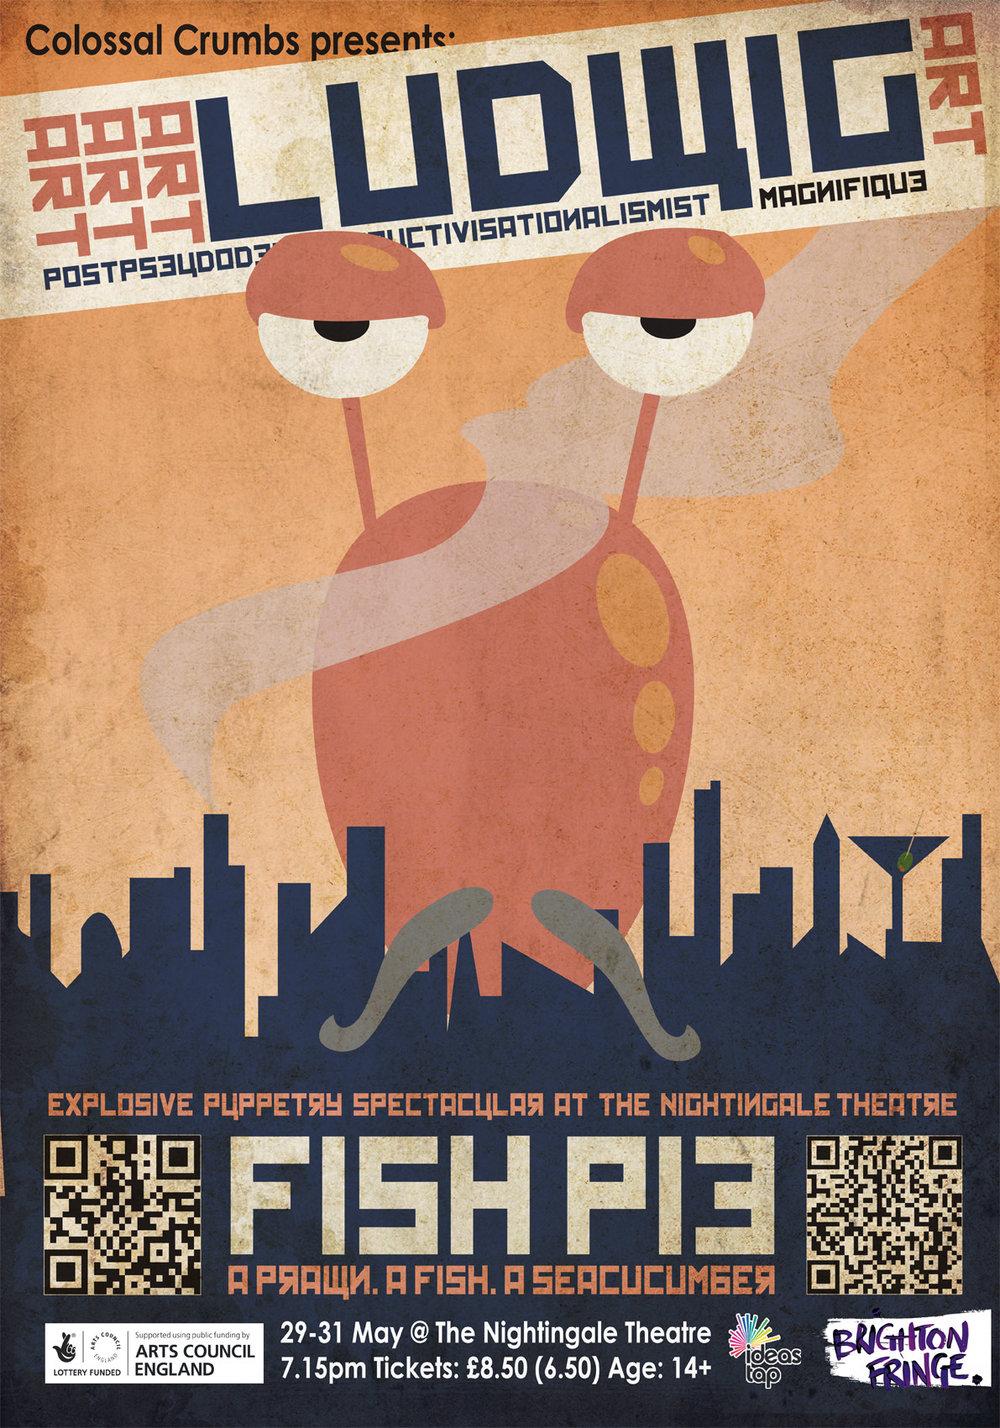 Poster: Festival Fringe best Poster/flyer award - Ulysses Black